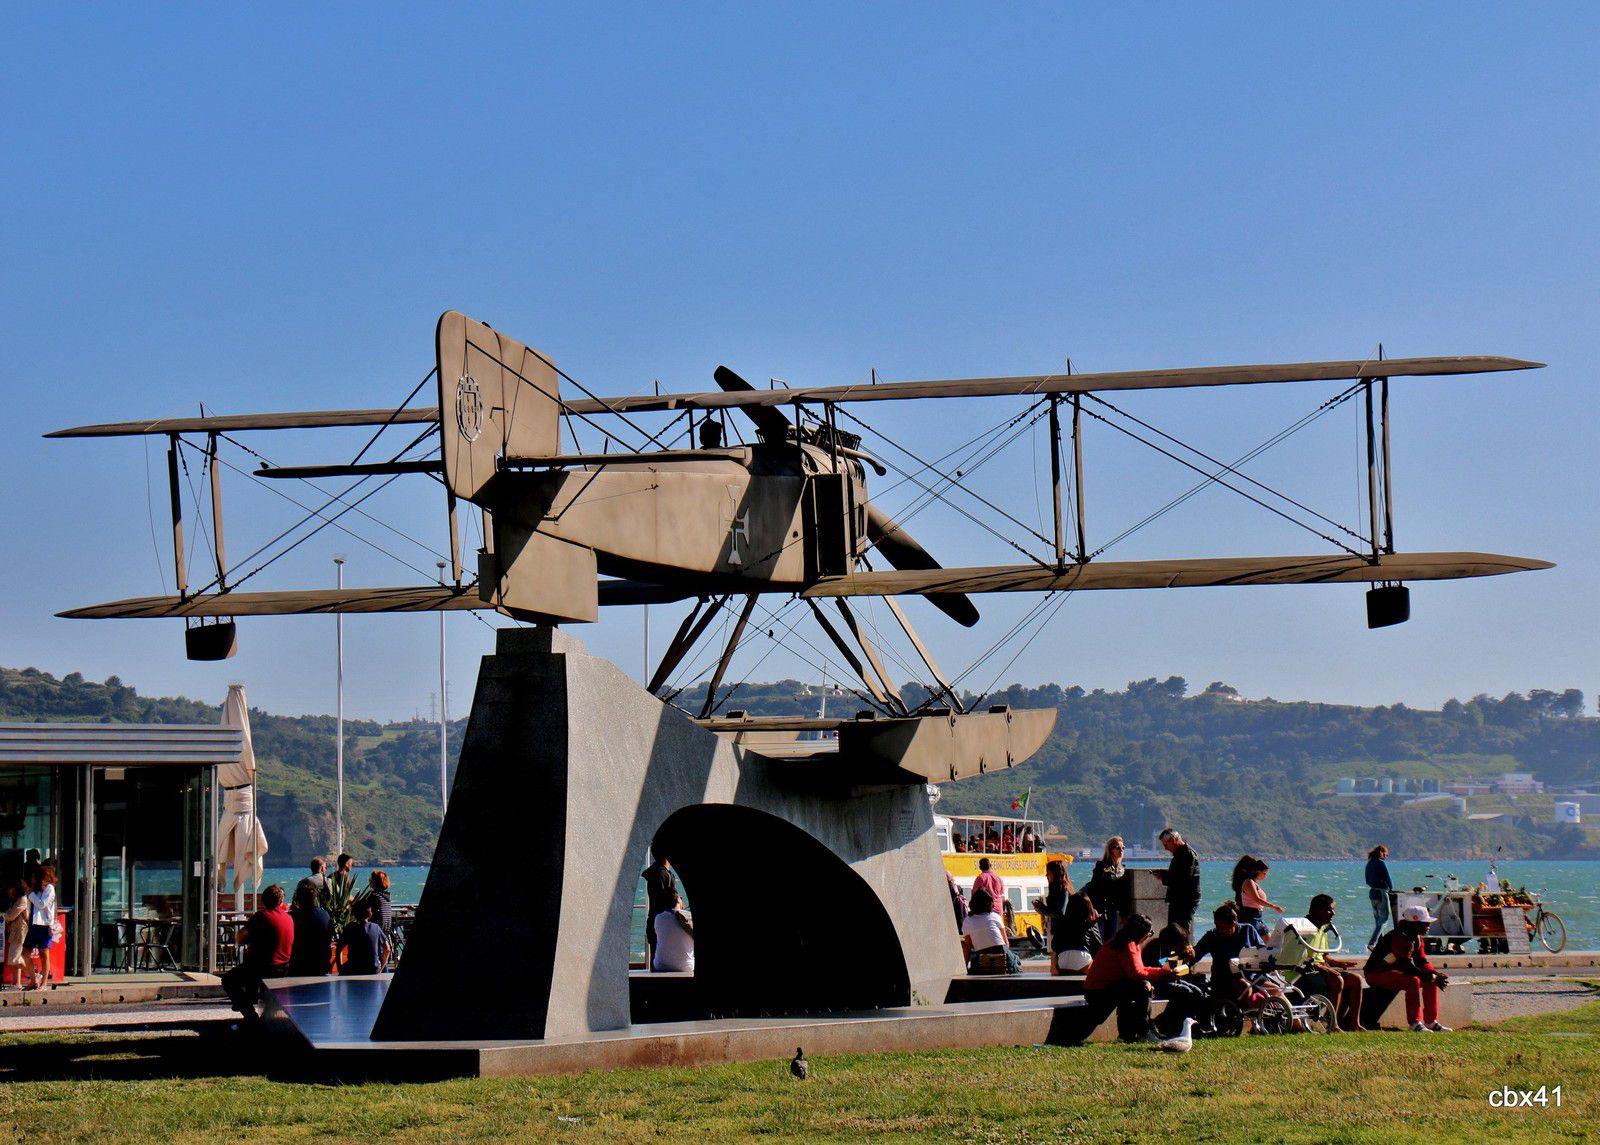 Réplique du Fairey III-B (Santa Cruz) - Lisbonne, Portugal